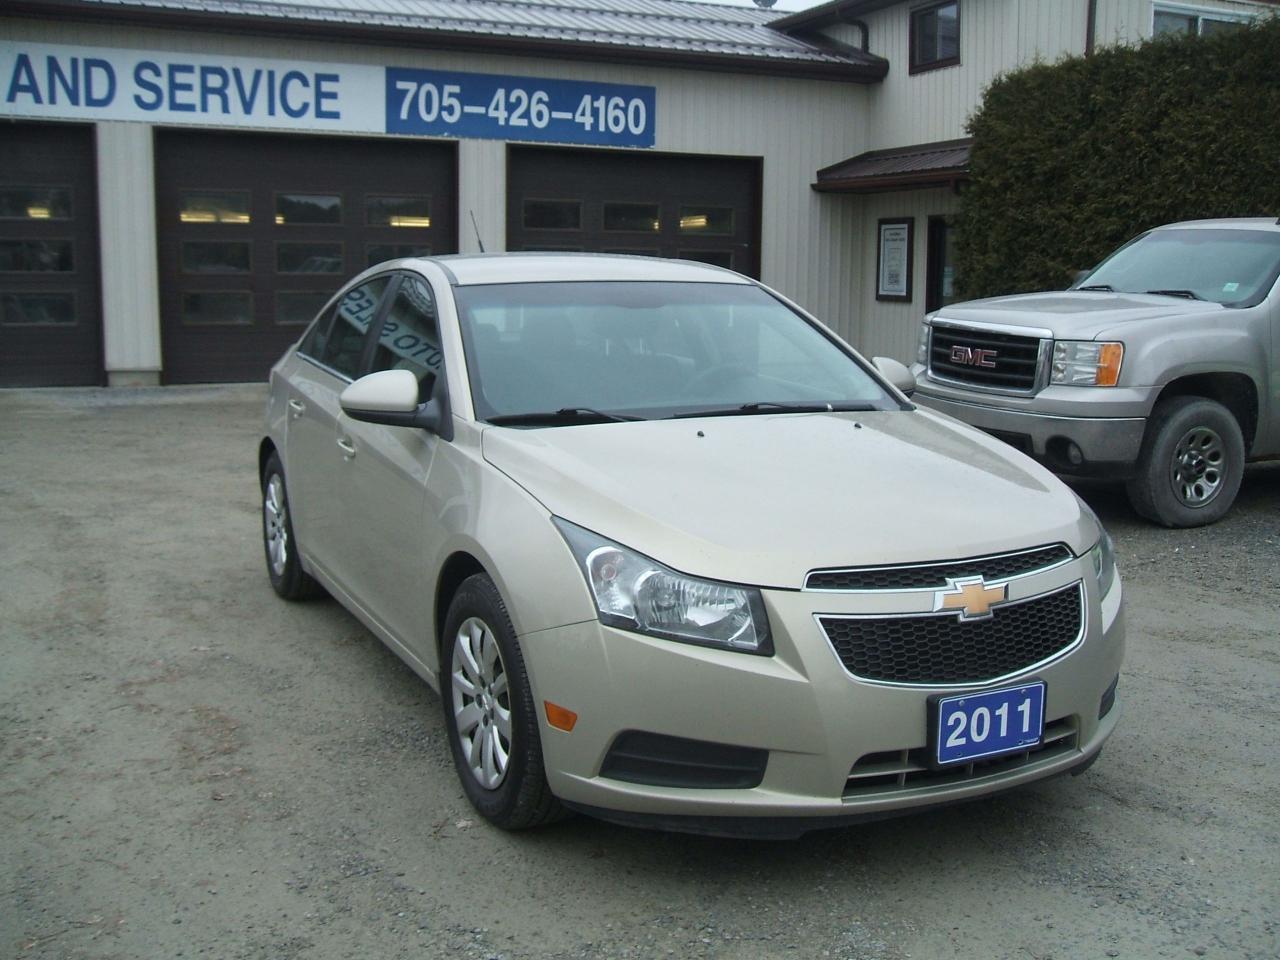 Photo of Beige 2011 Chevrolet Cruze